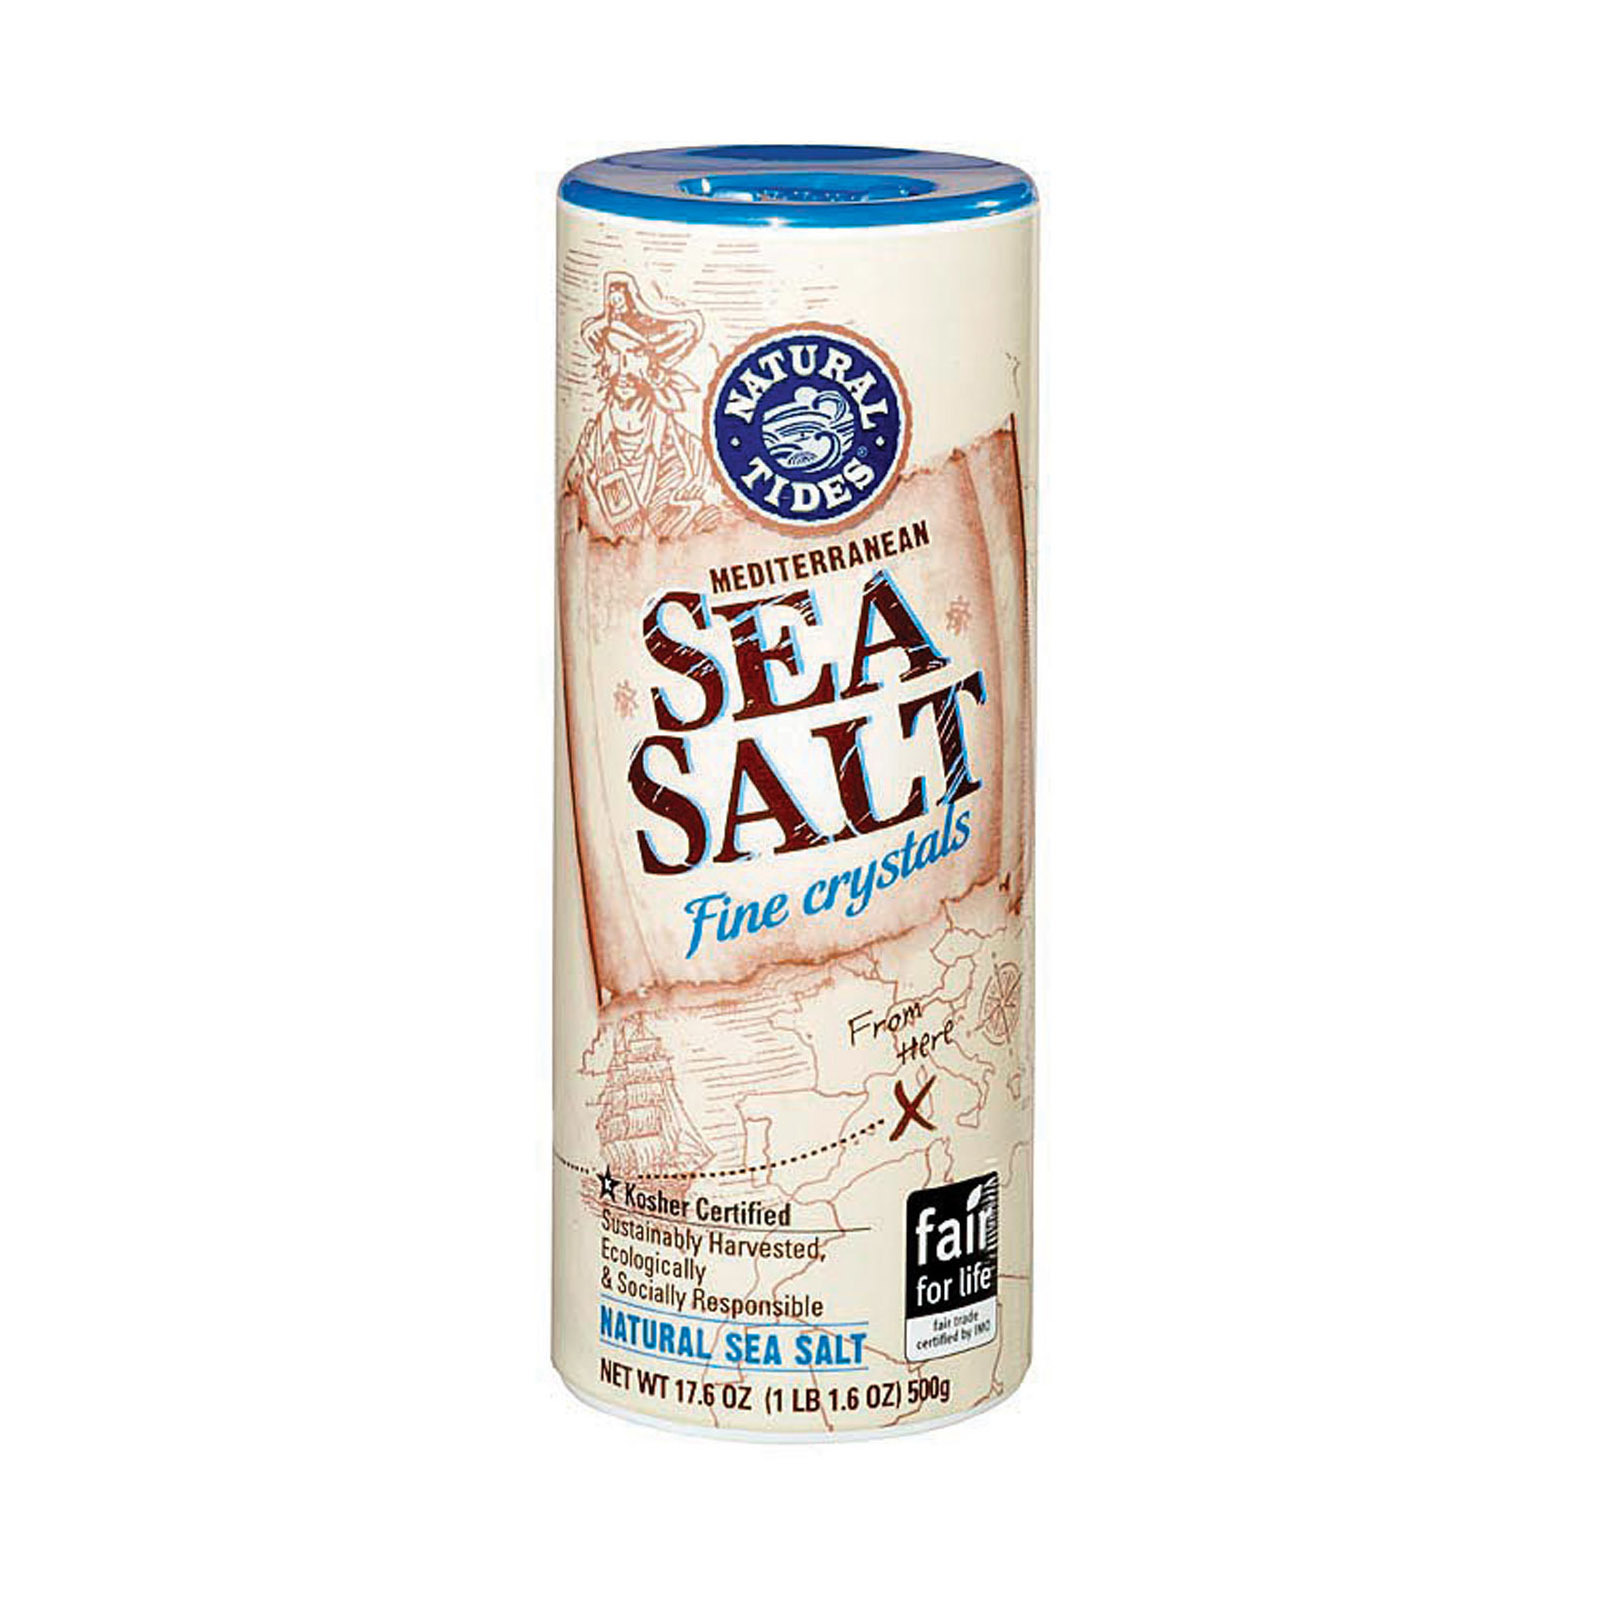 Natural Tides Mediterranean Sea Salt - Fine Crystals - Case of 12 - 17.6 oz.